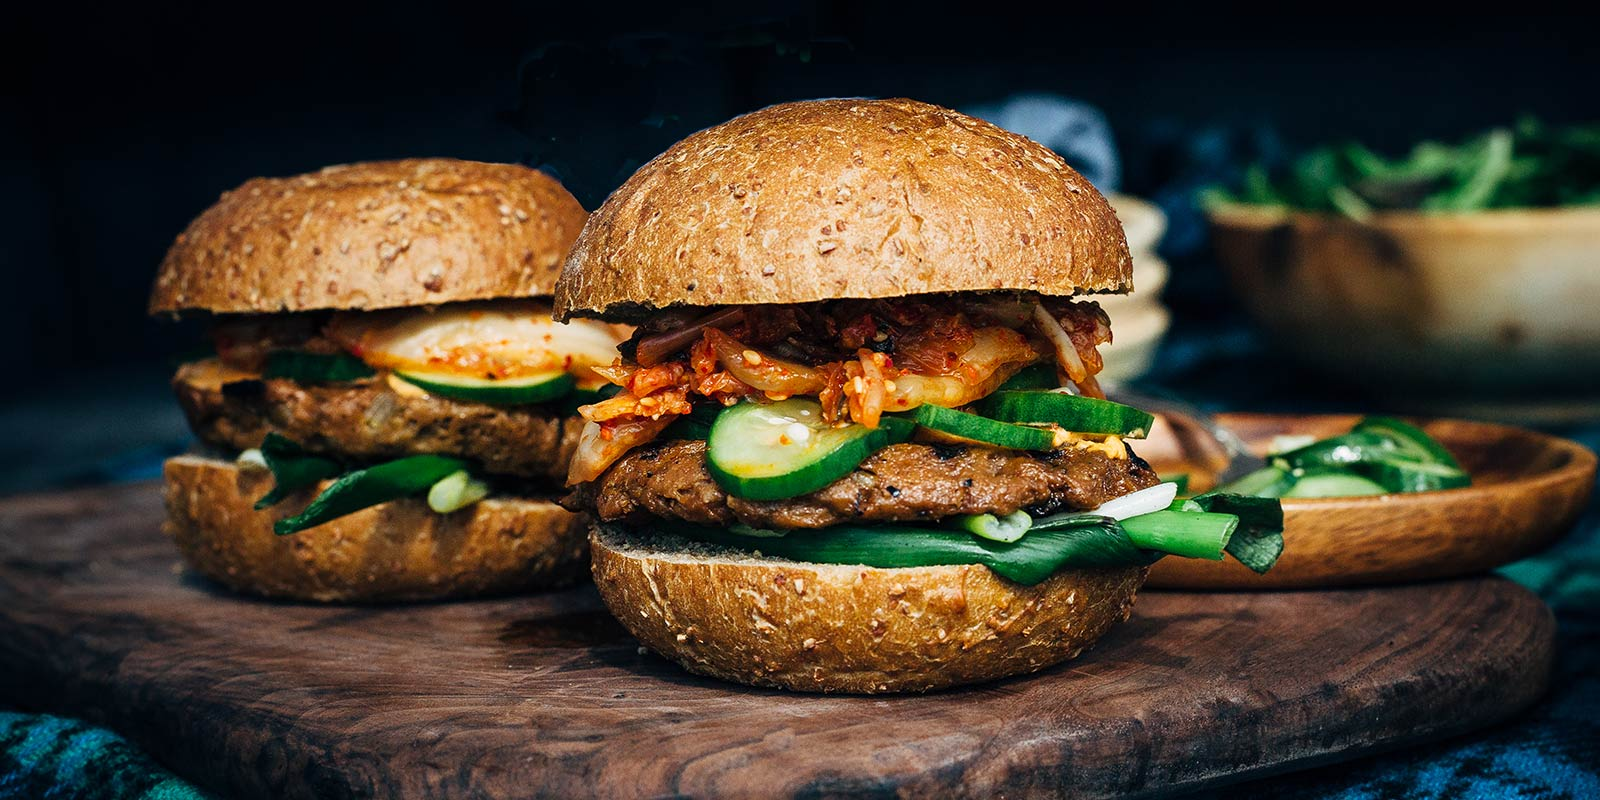 Tangy Cucumber & Kimchi Burger